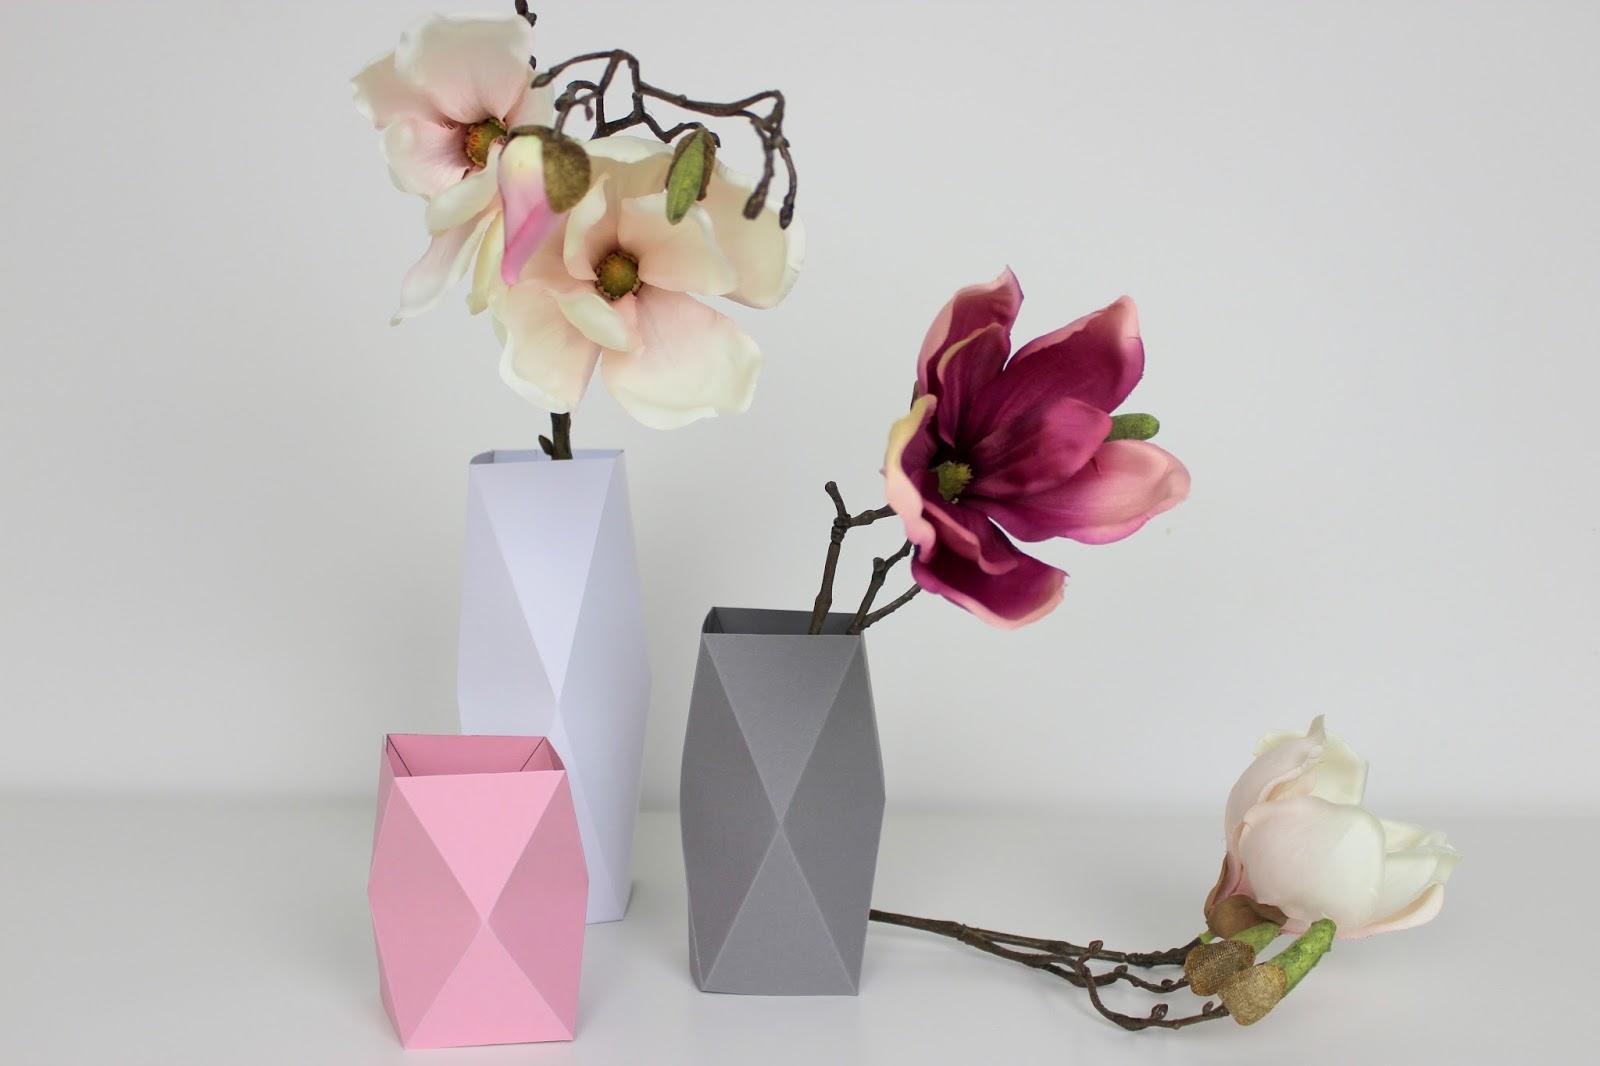 Geniale Dekoration aus Papier: DIY Origami Vasen in weniger als 5 Minuten selber machen {mit gratis Schnittmuster}